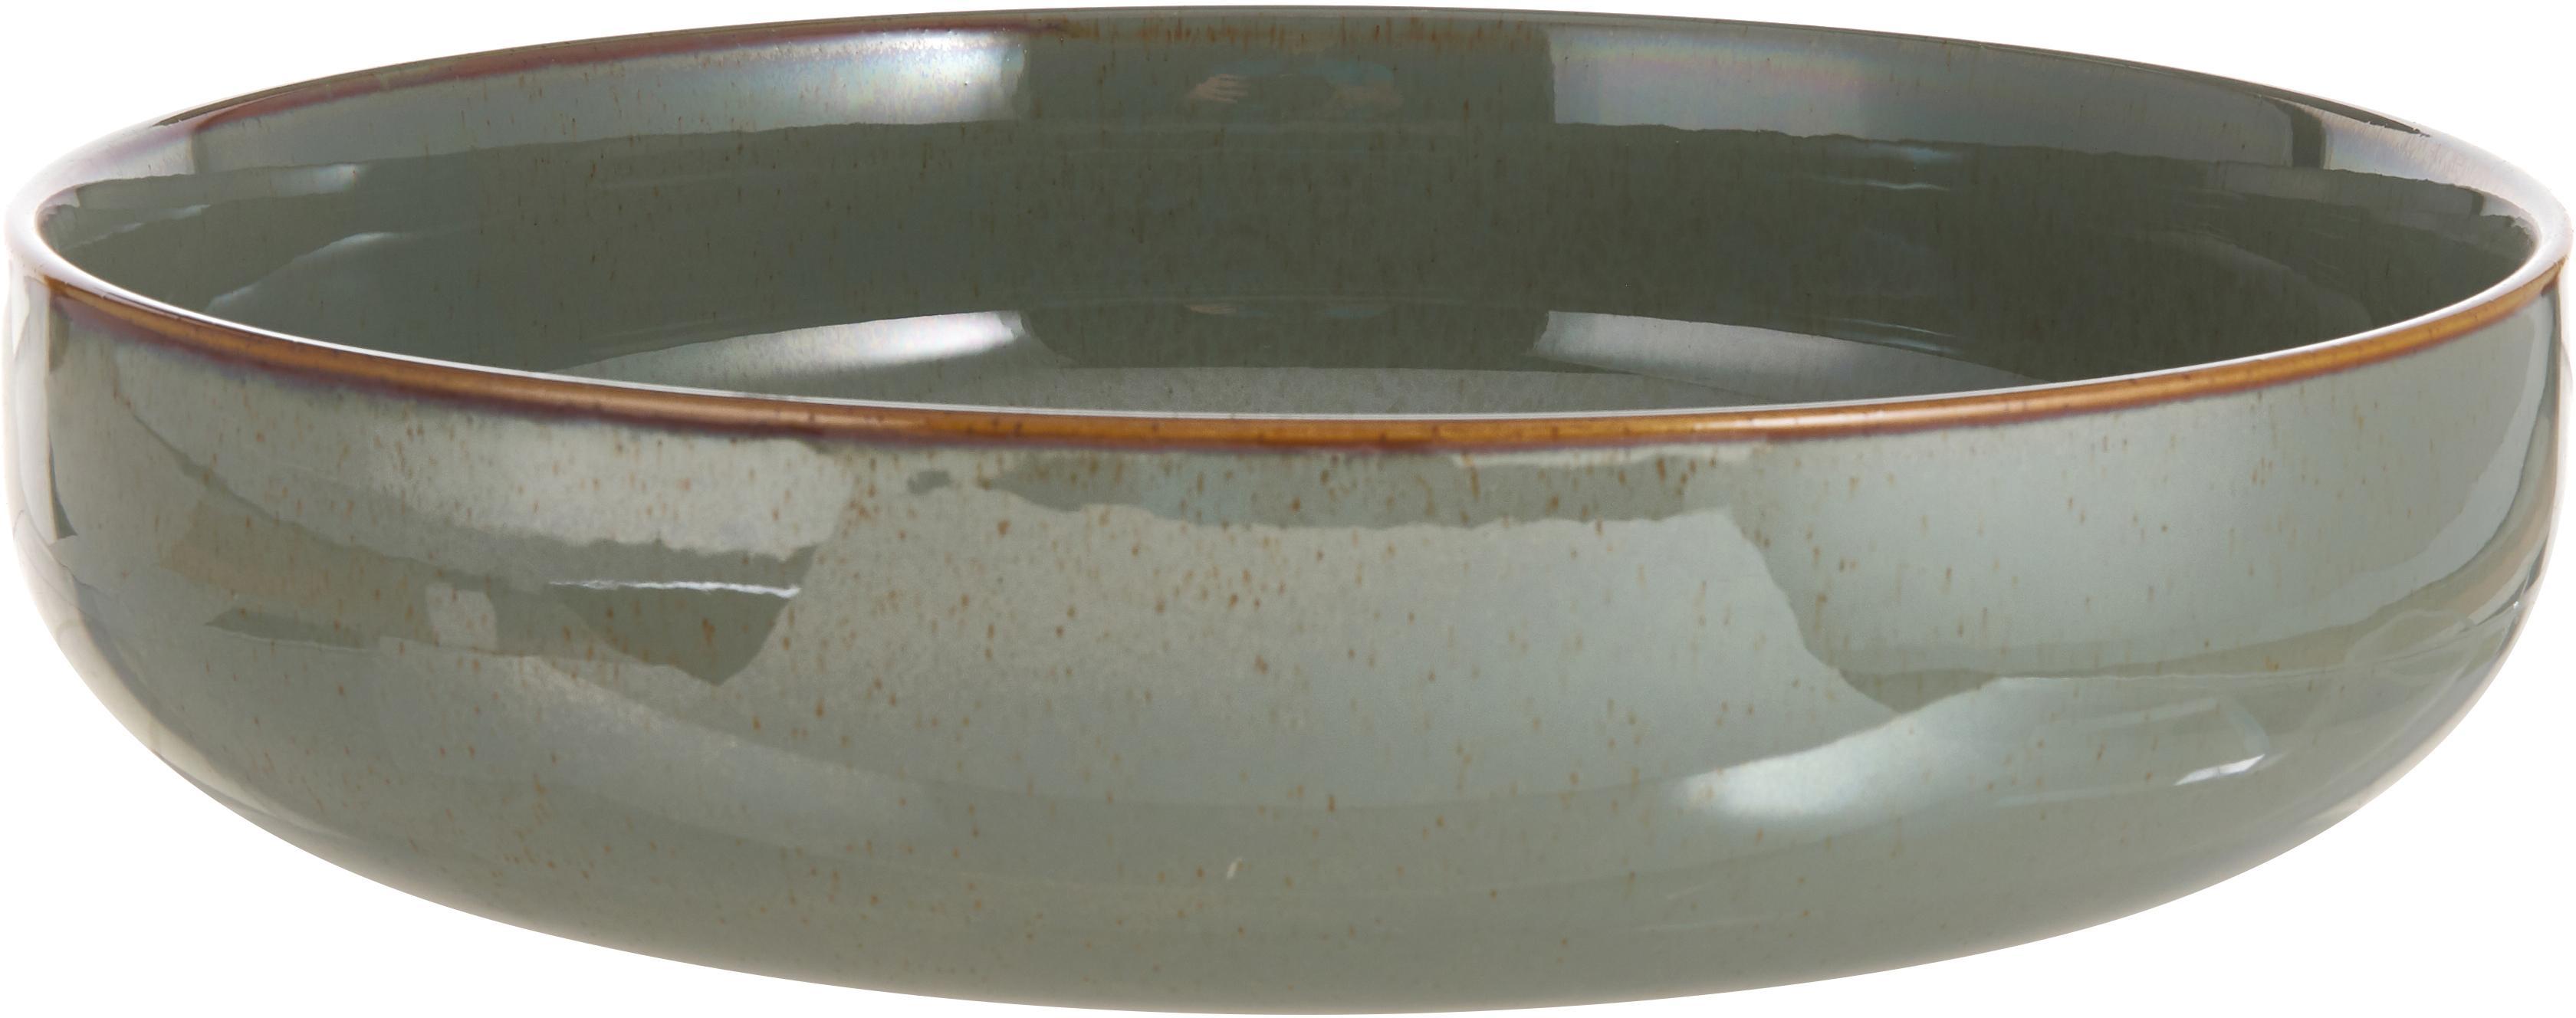 Fuente Pixie, Gres, Verde, Ø 28 x Al 7 cm